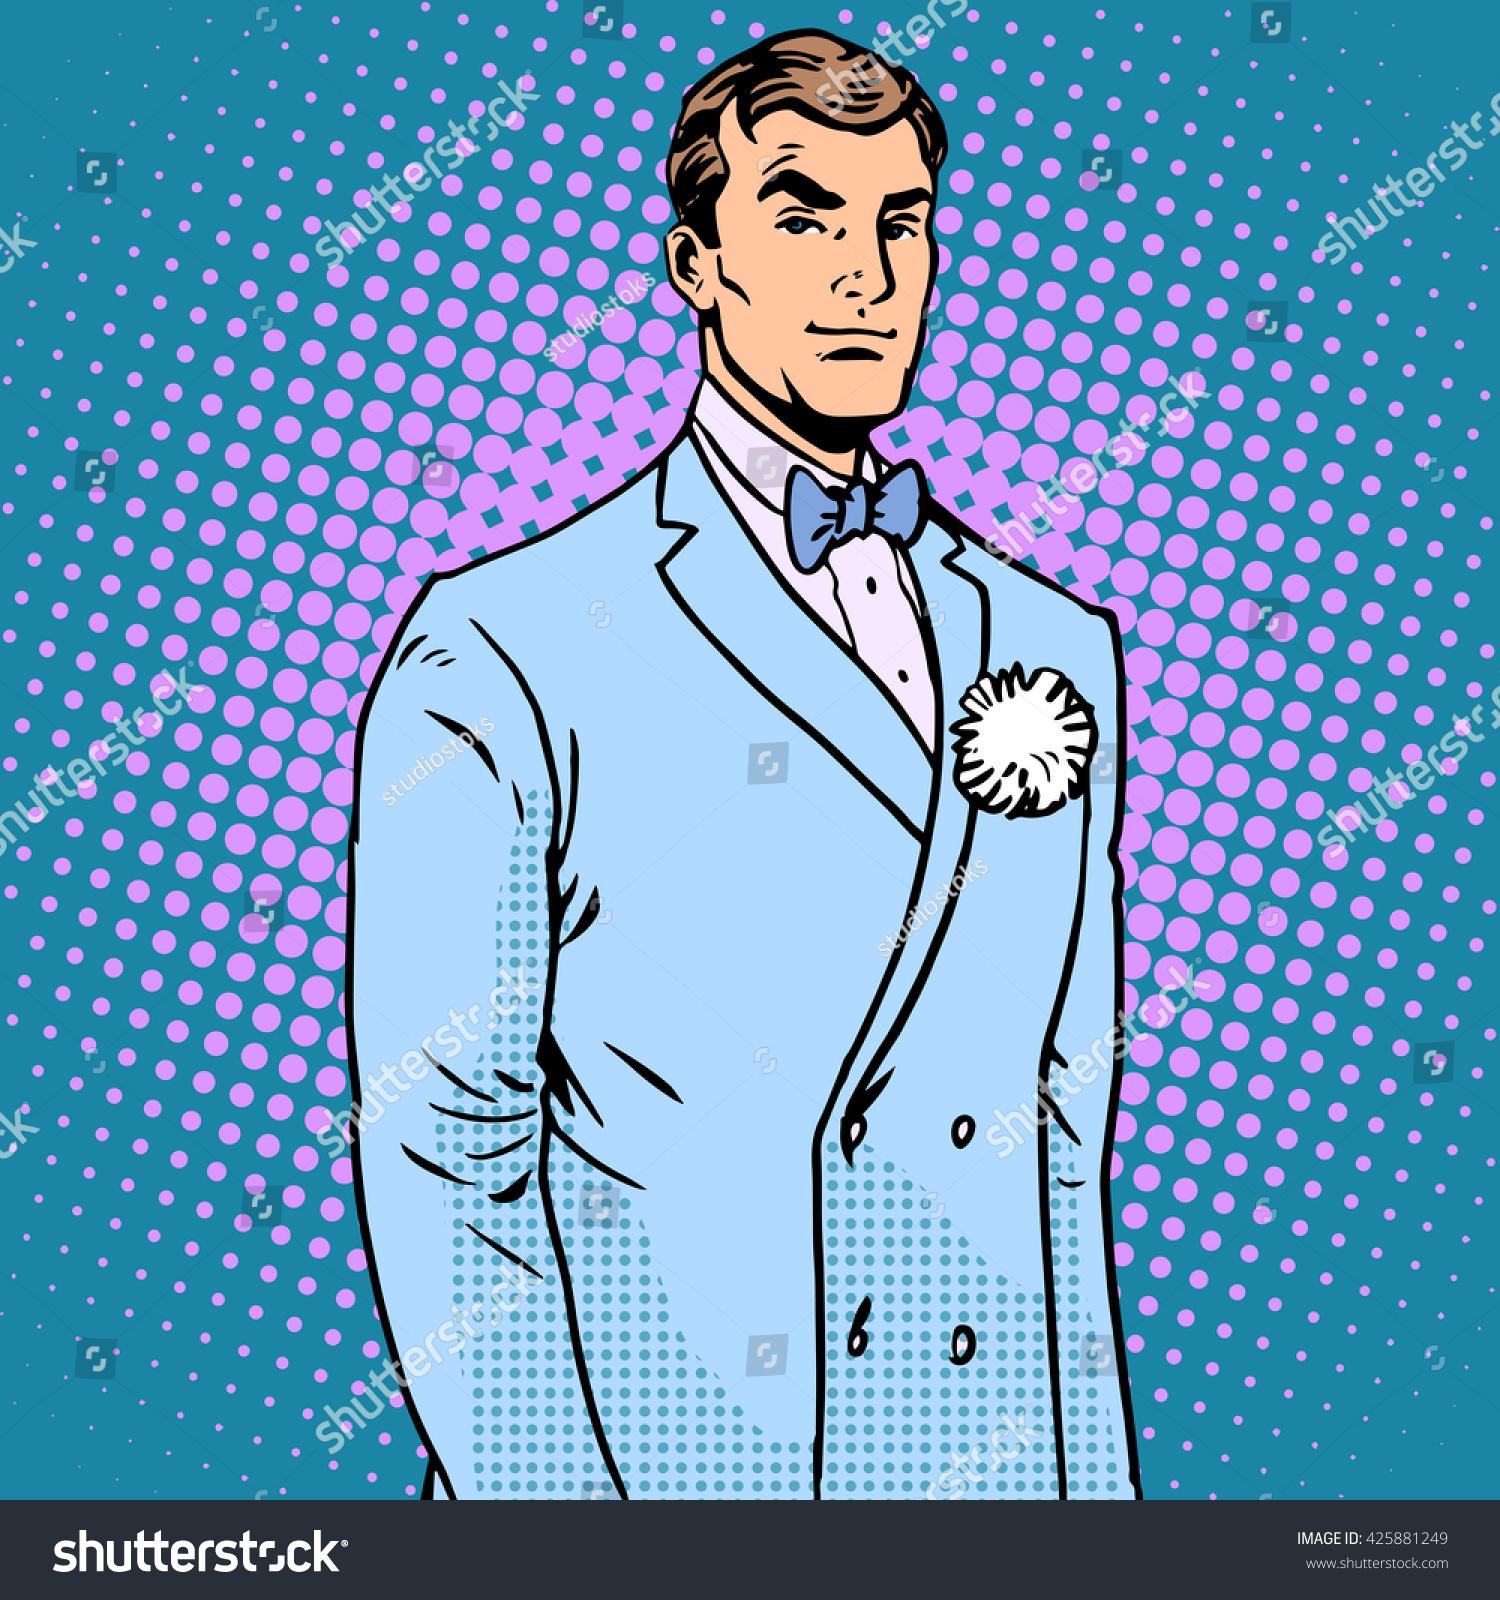 Groom Wedding Suit Stock Illustration 425881249 - Shutterstock